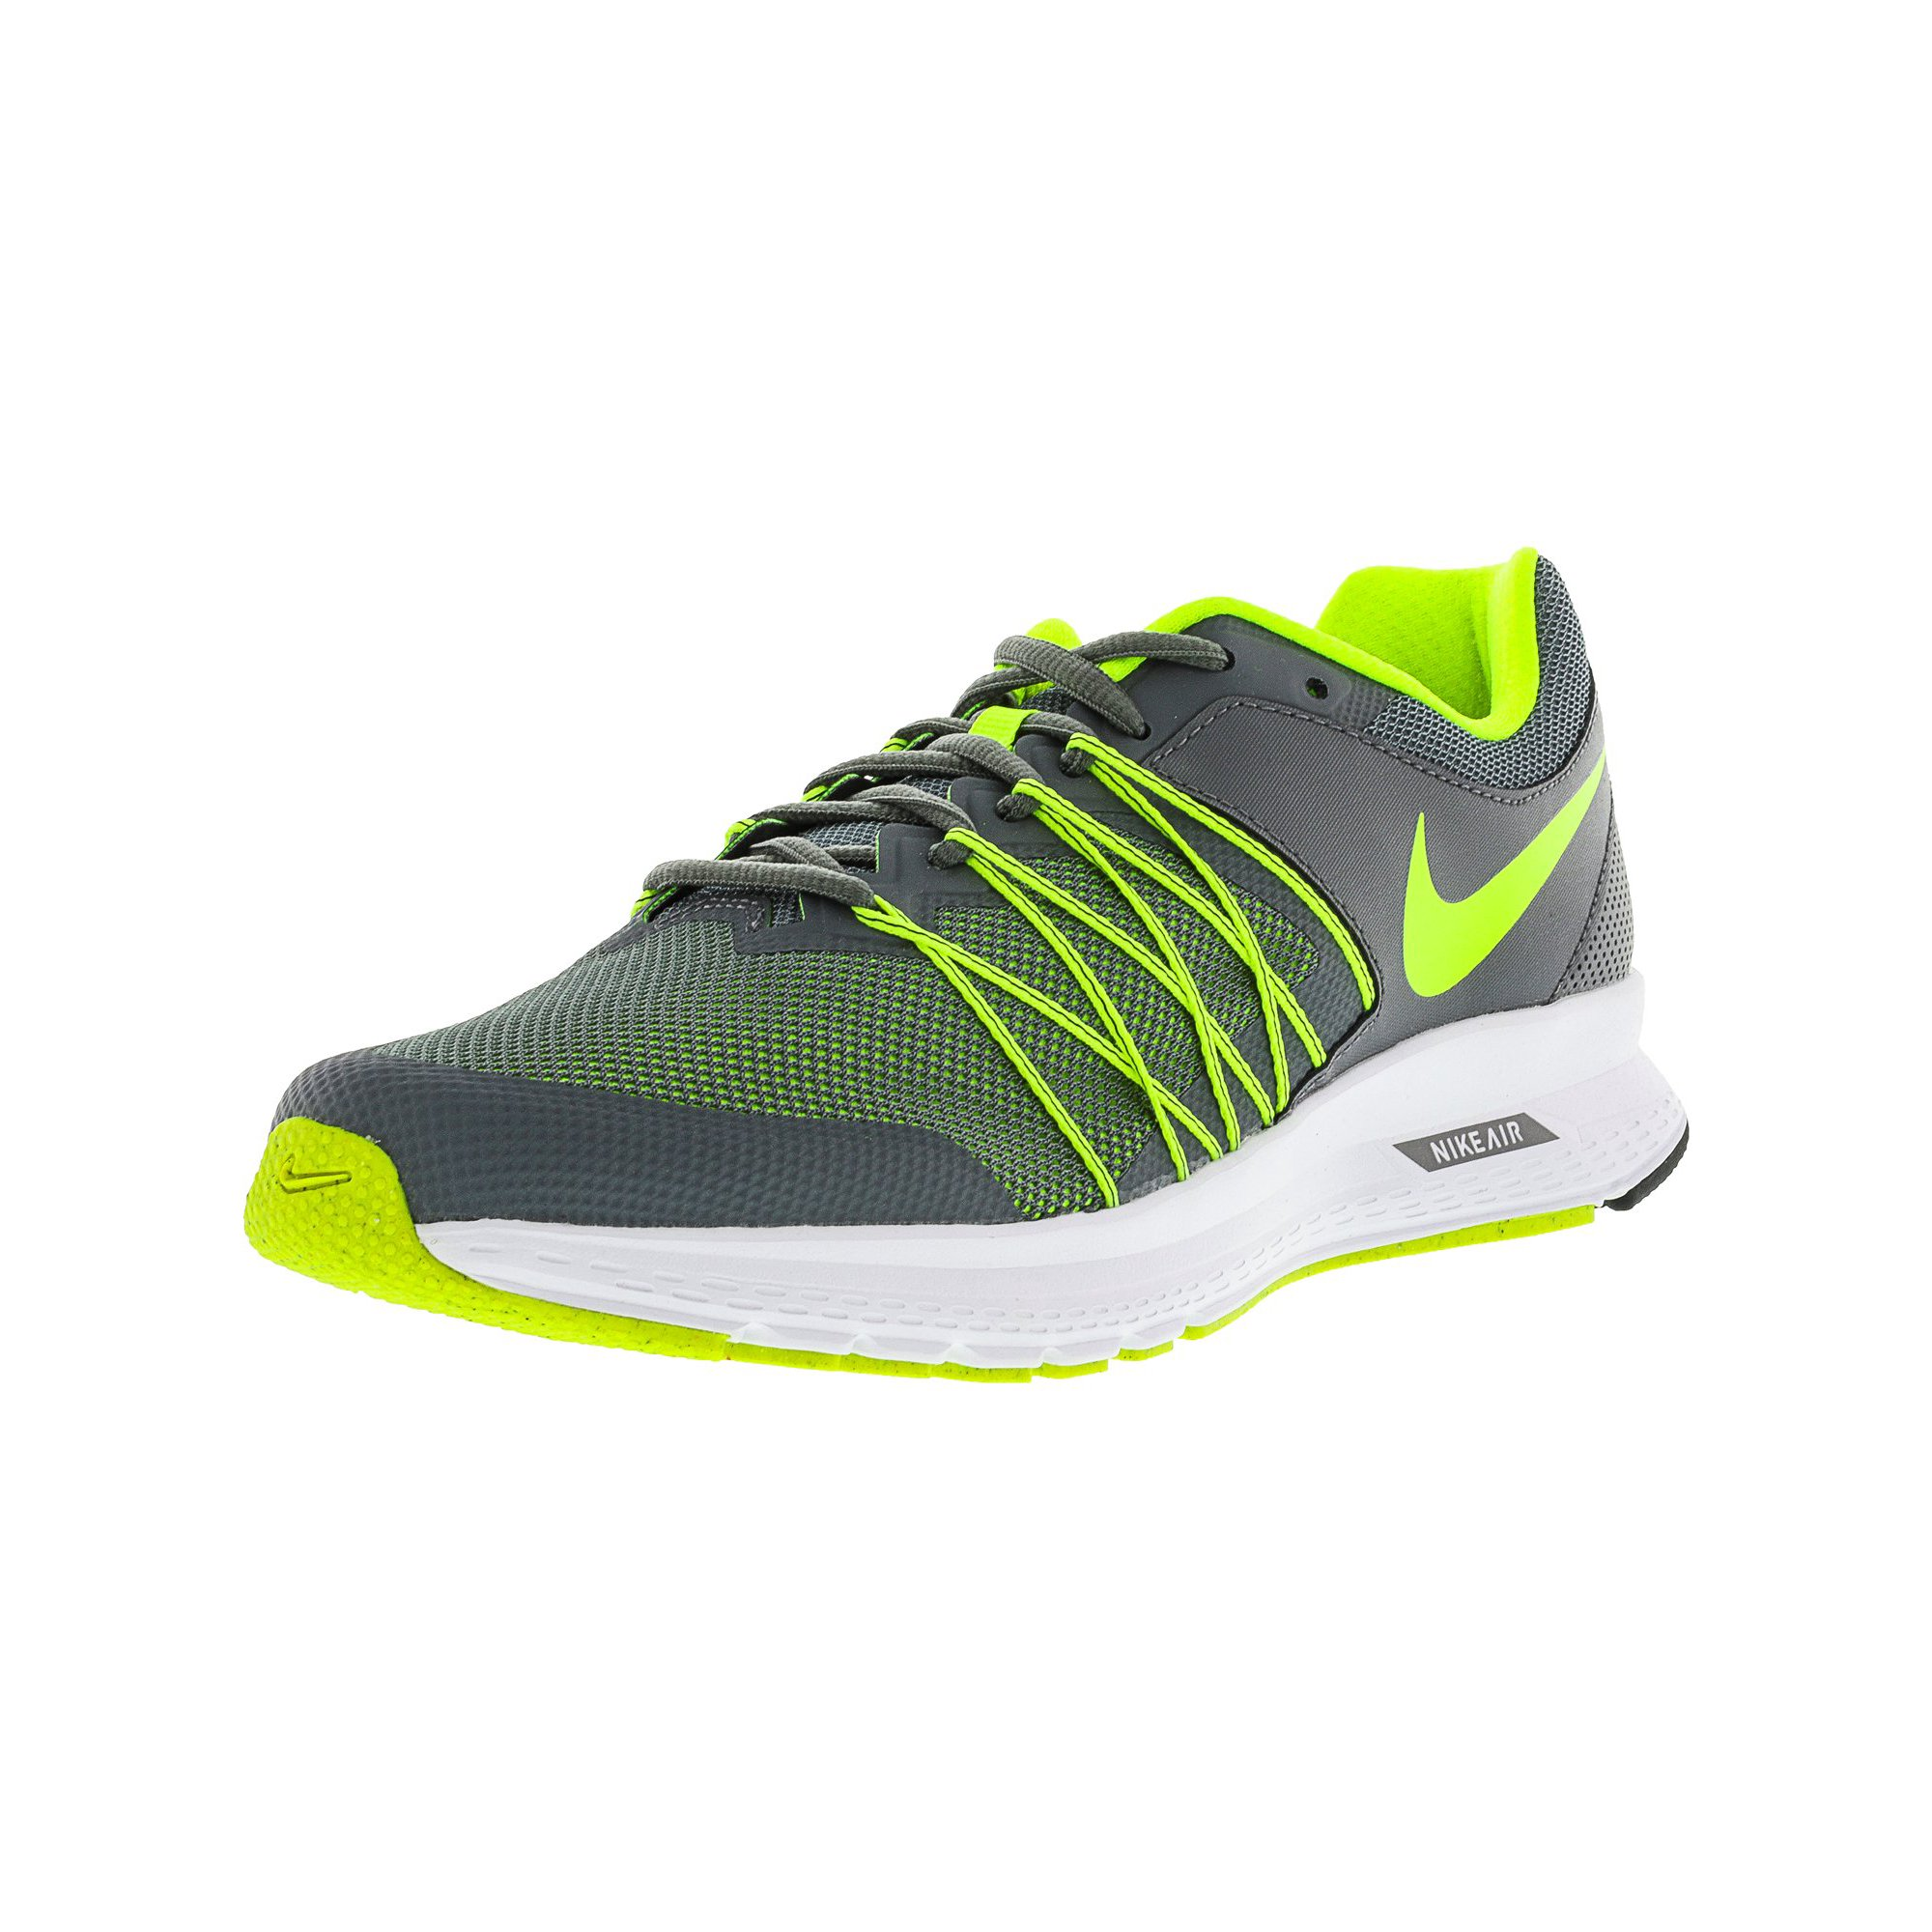 more photos dbace abfb0 Nike Men's Air Relentless 6 Cool Grey / Volt-Black-White ...